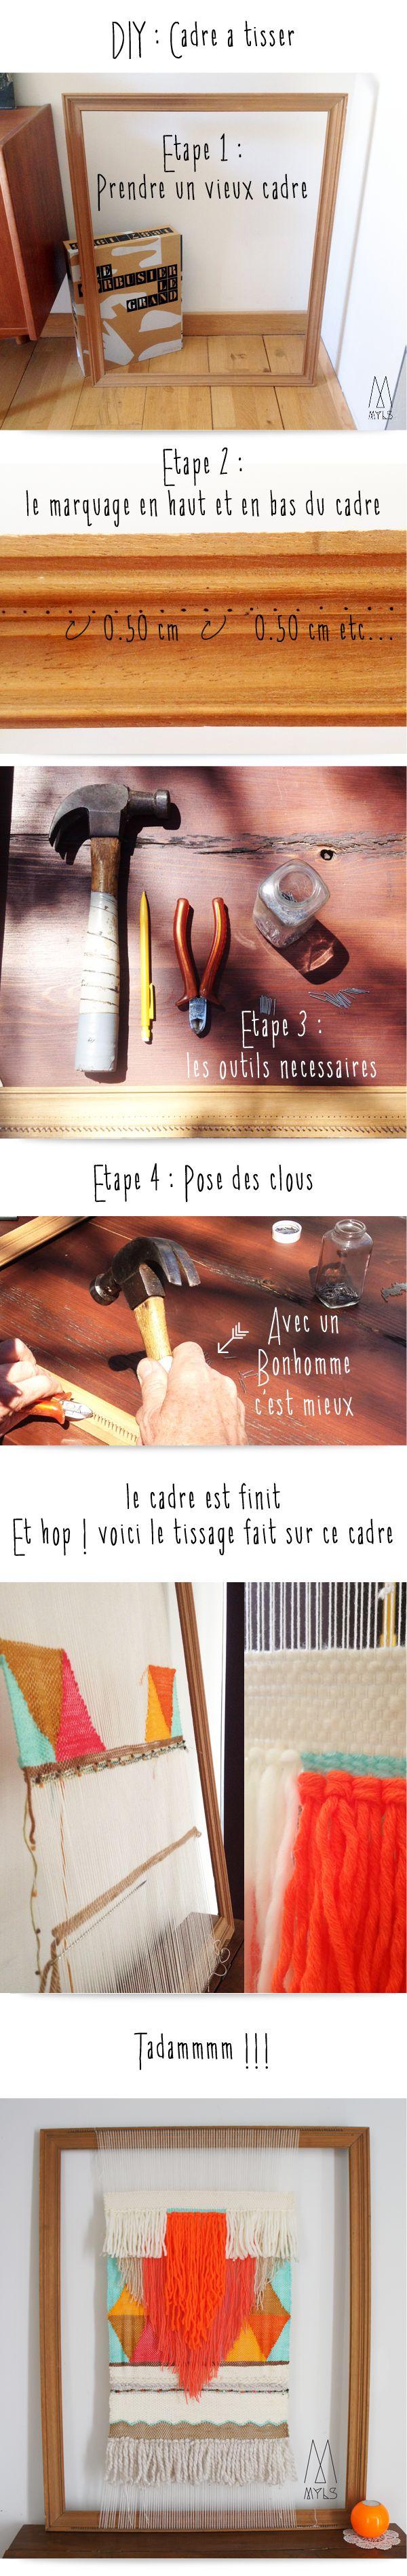 DIY CADRE _METIER_A TISSER - MYLS - do it yourself                                                                                                                                                     Plus